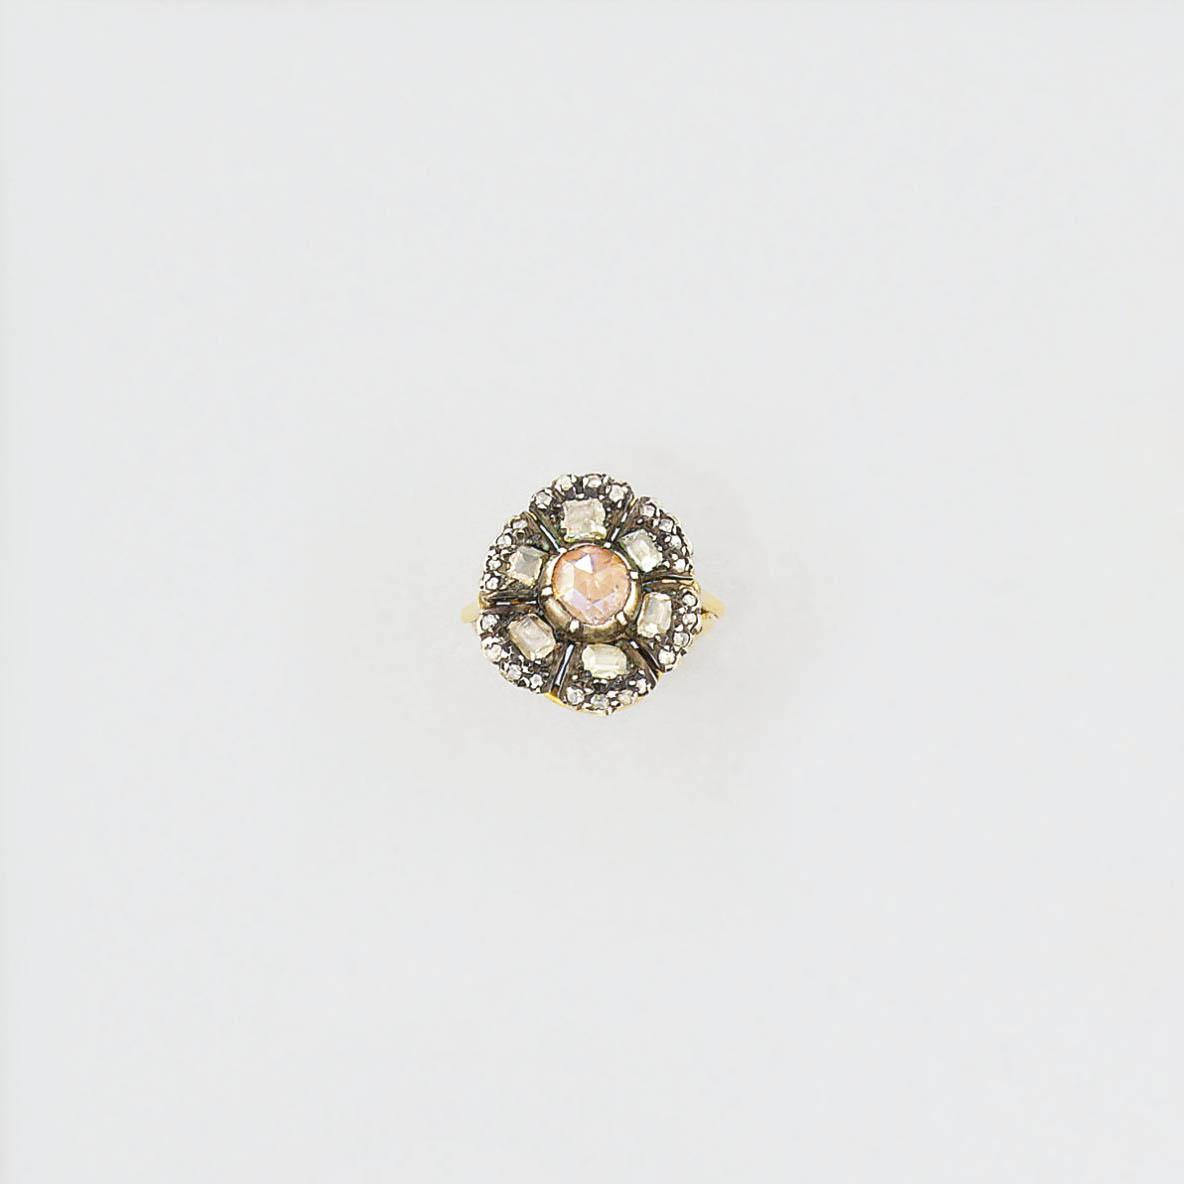 An early 18th century diamond